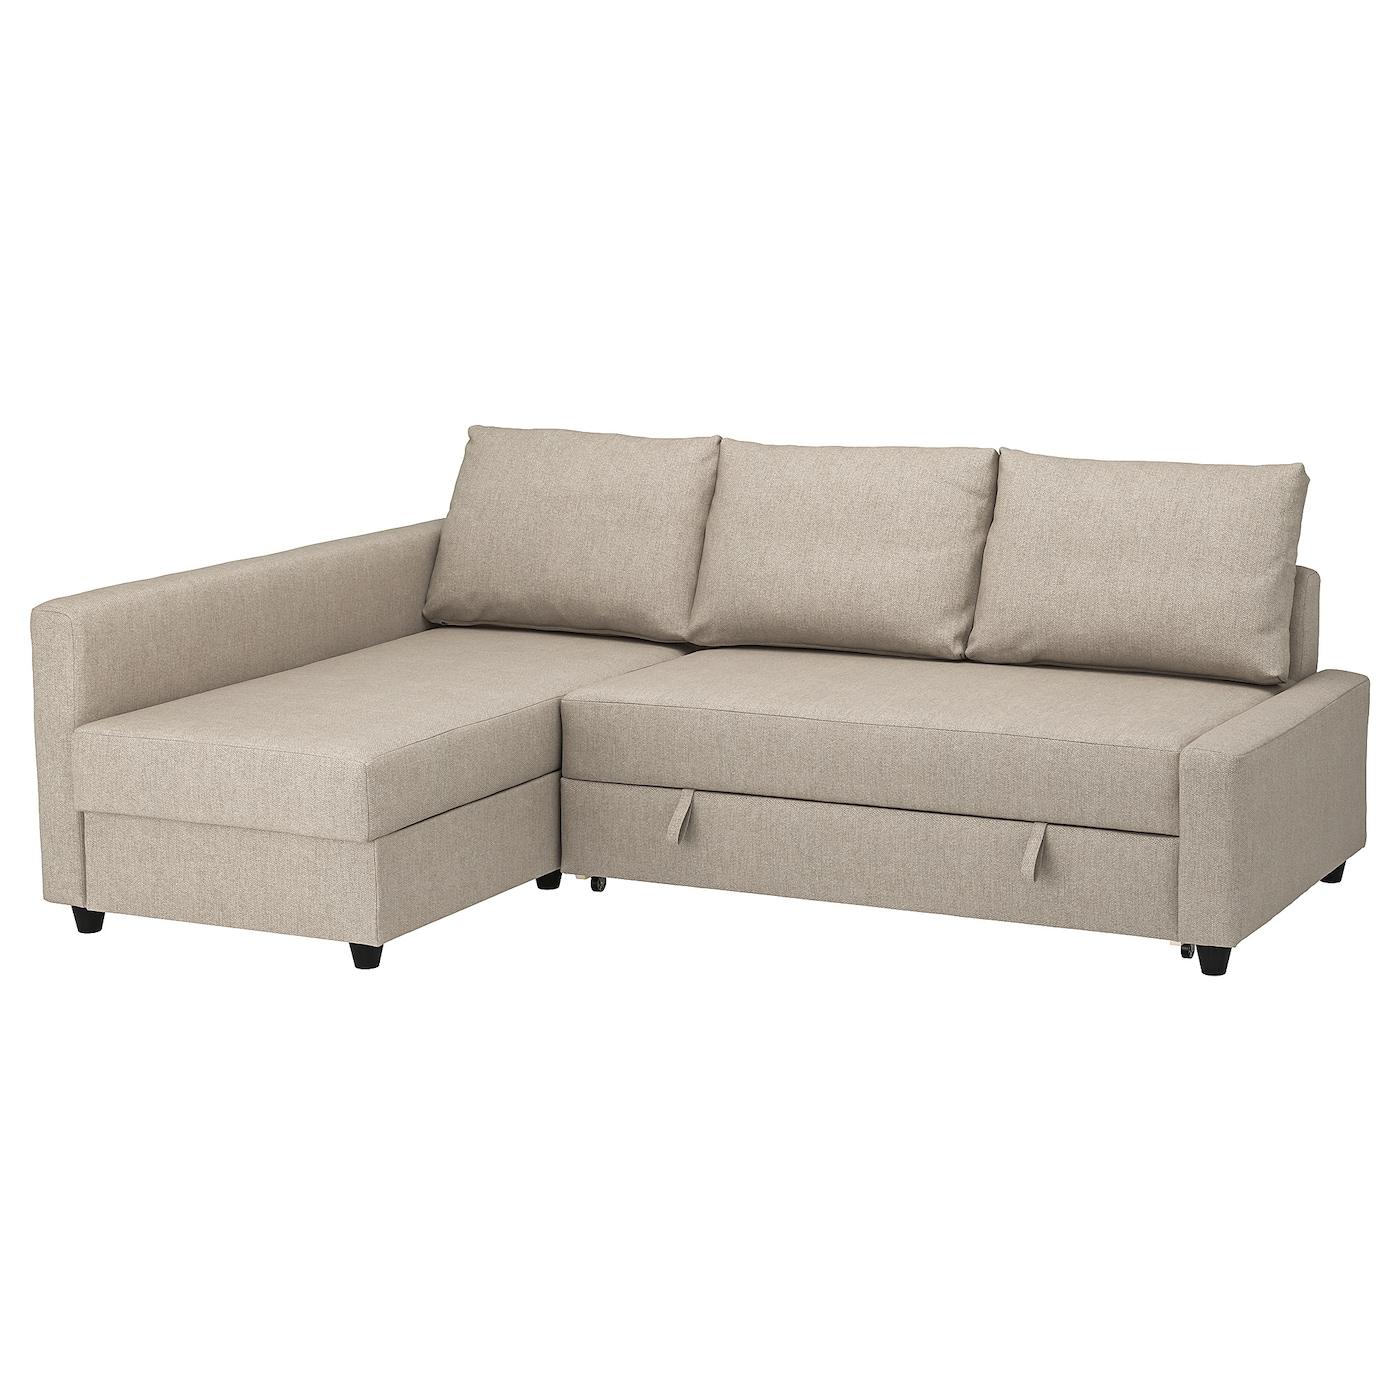 Friheten Corner Sofa Bed With Storage – Hyllie Beige – Ikea Throughout Ikea Corner Sofas With Storage (View 15 of 15)